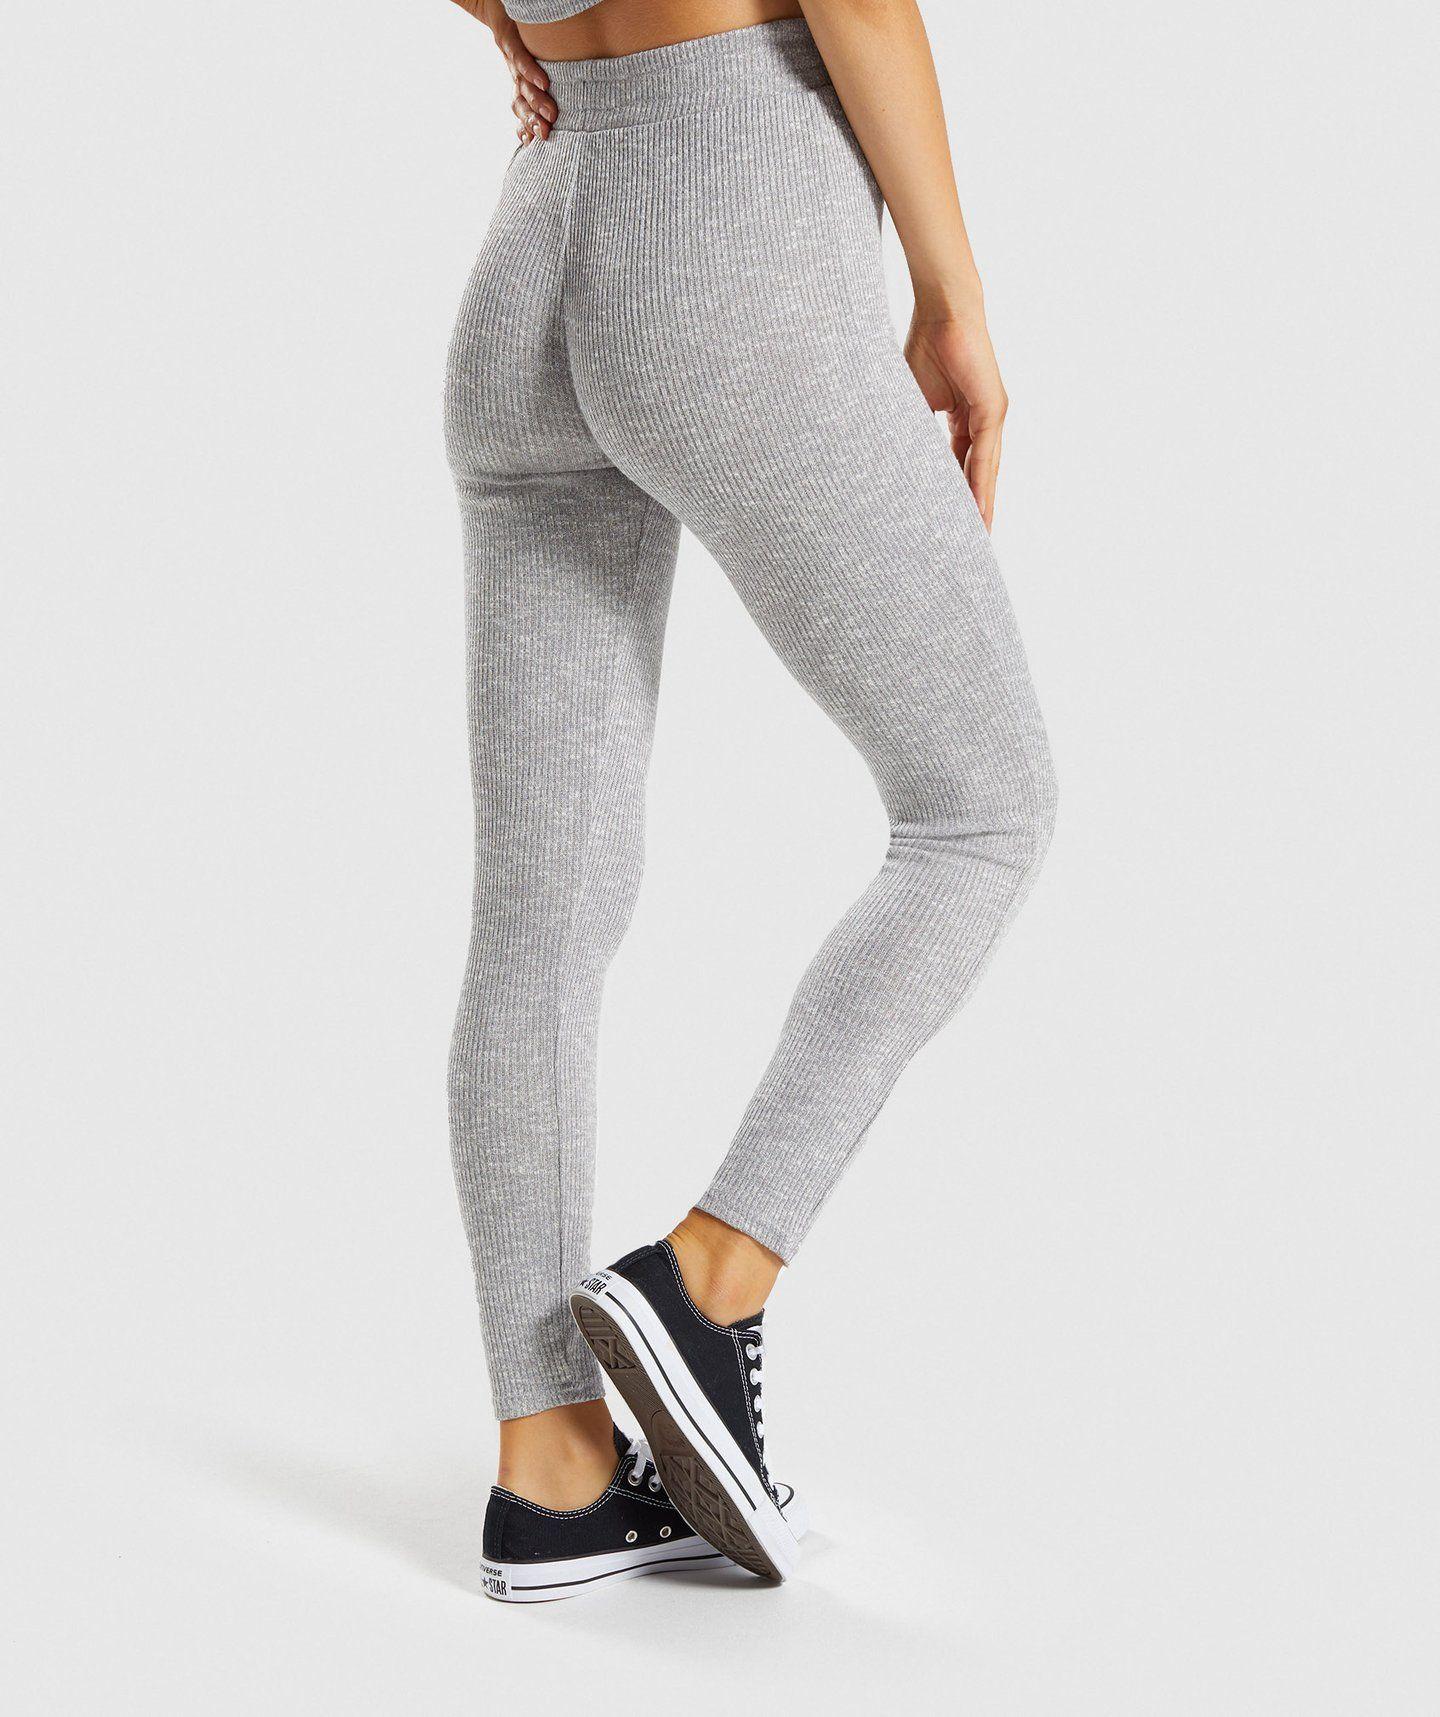 0d302b13d966f Gymshark Slounge Leggings - Light Grey Marl in 2019 | New Things to ...